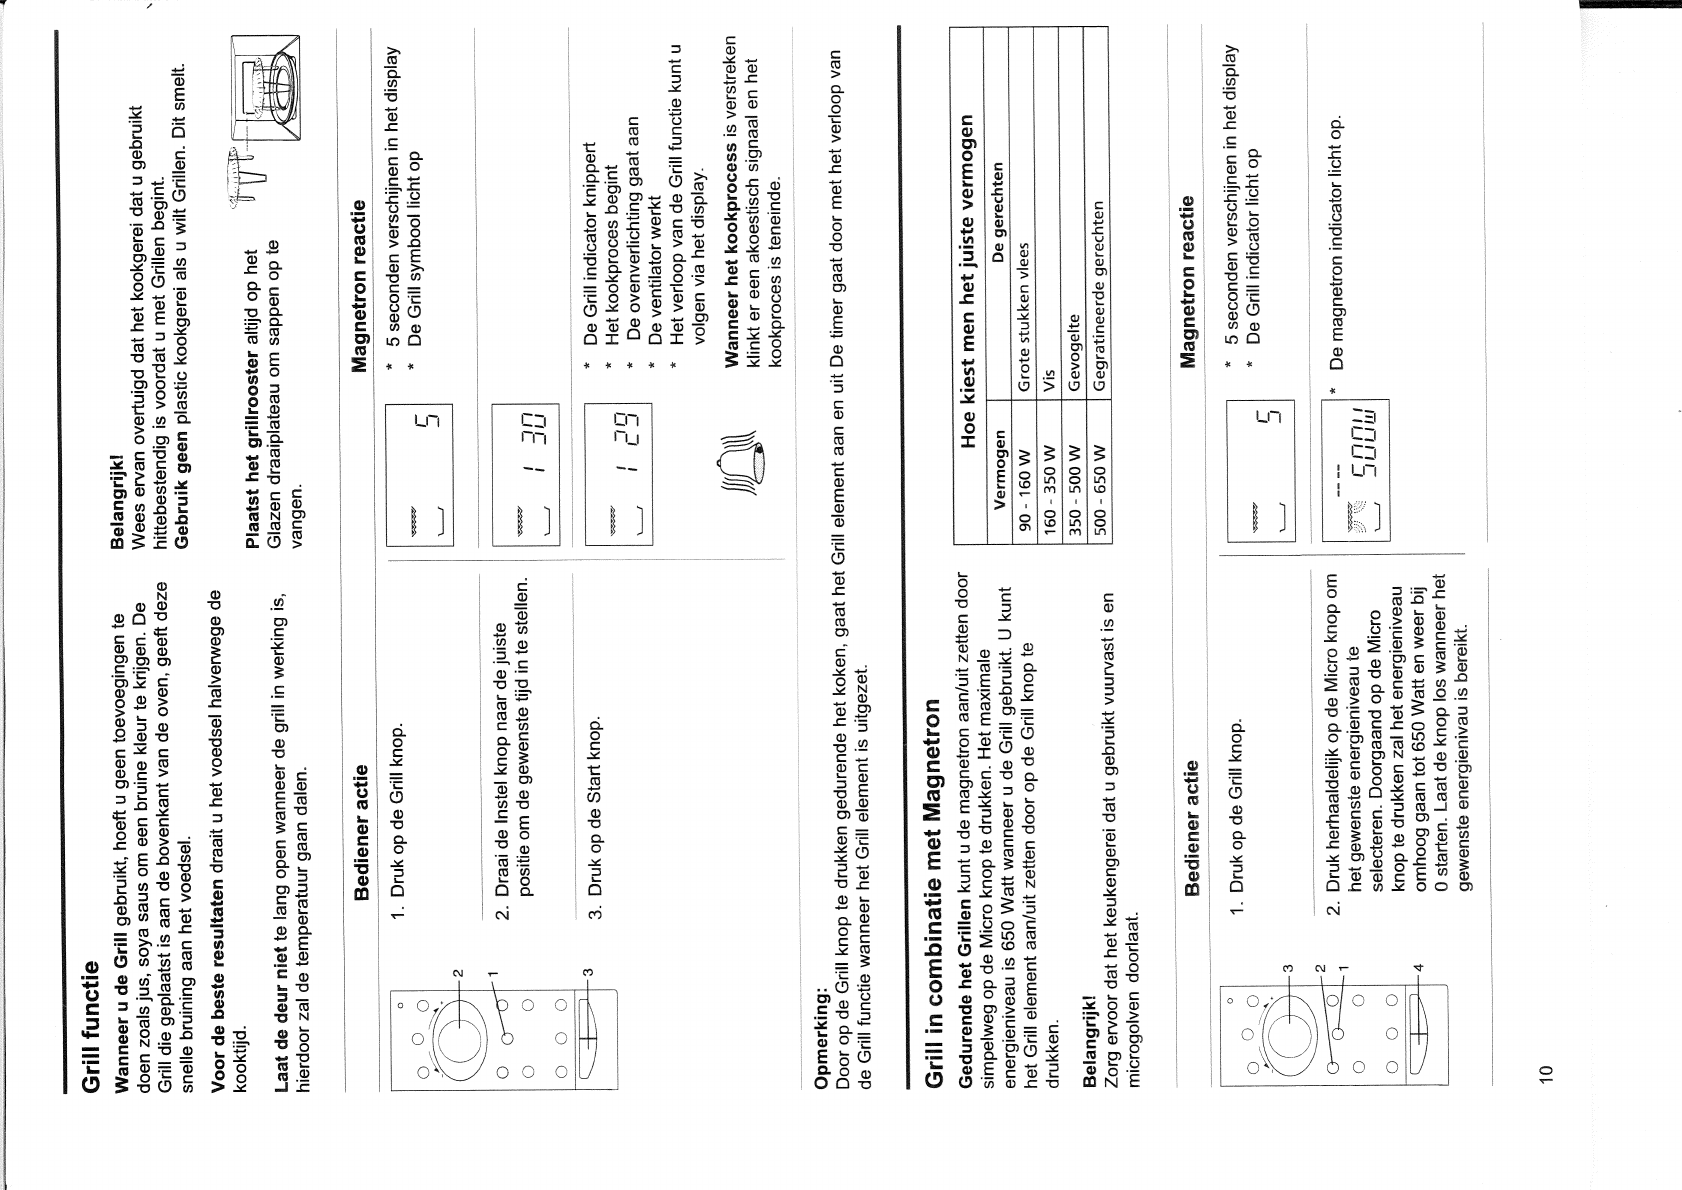 whirlpool vip 34 microwave manual